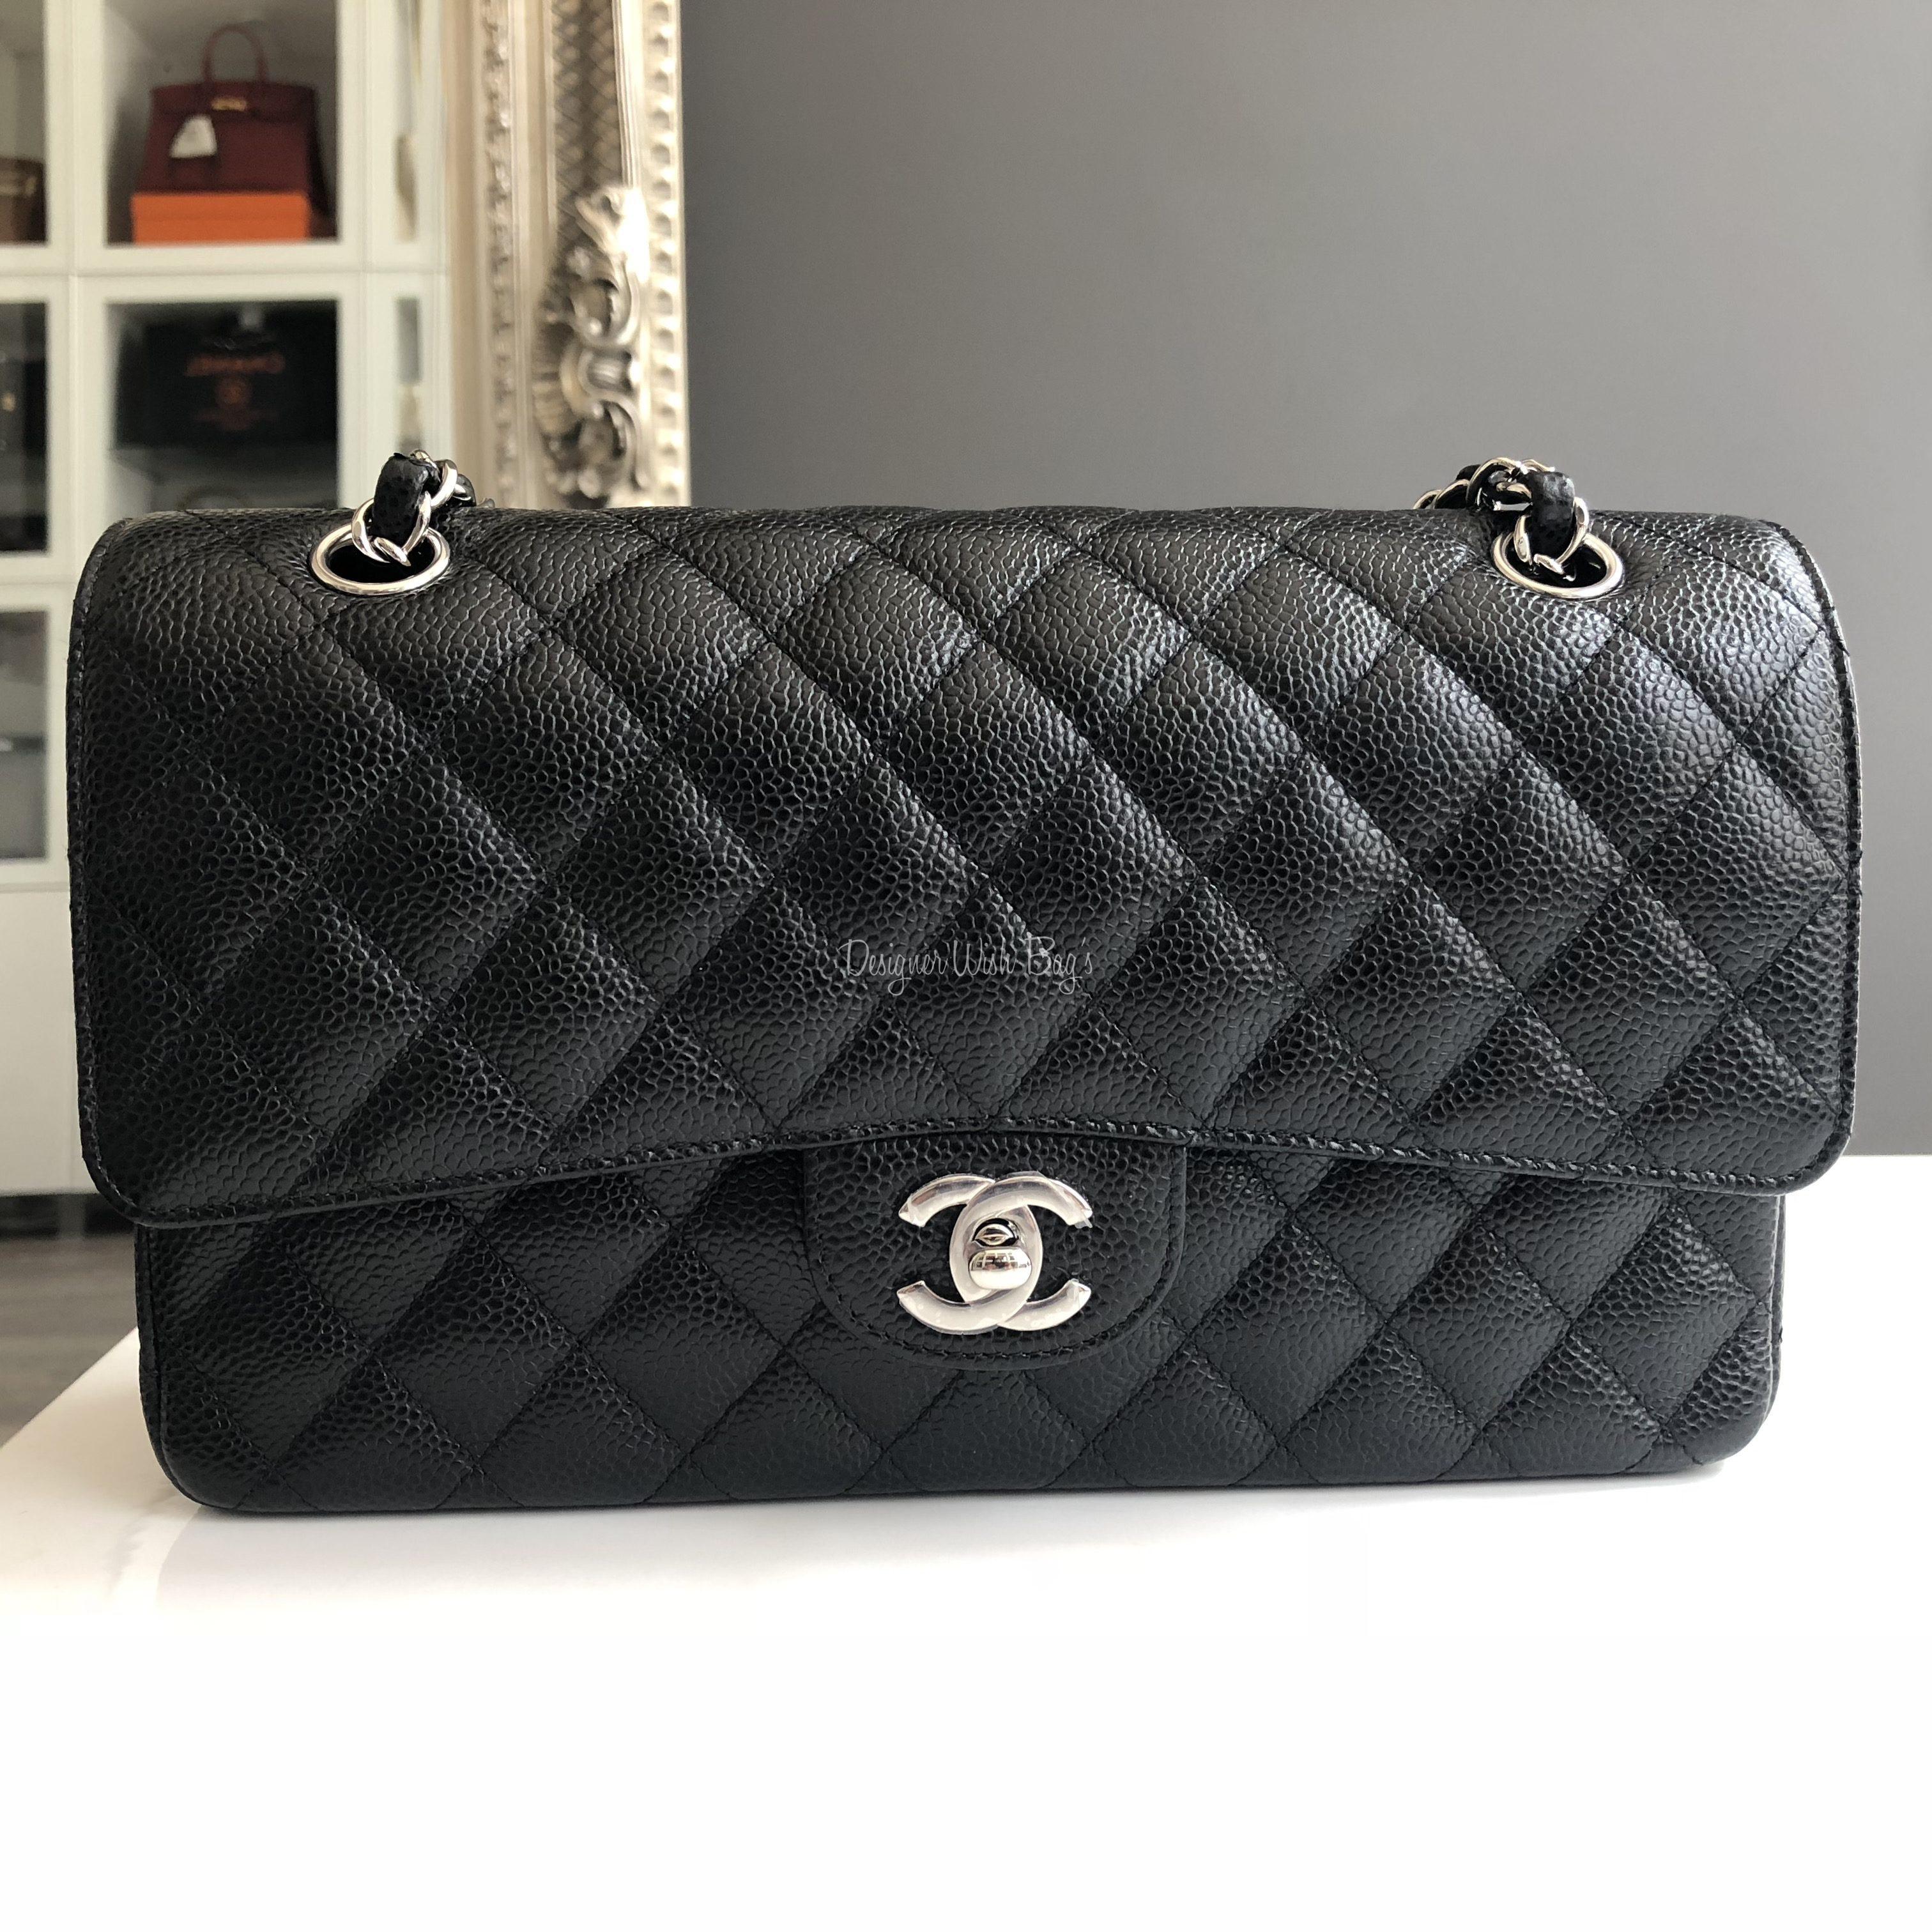 fccef3e69f74 Chanel Timeless Medium Caviar -